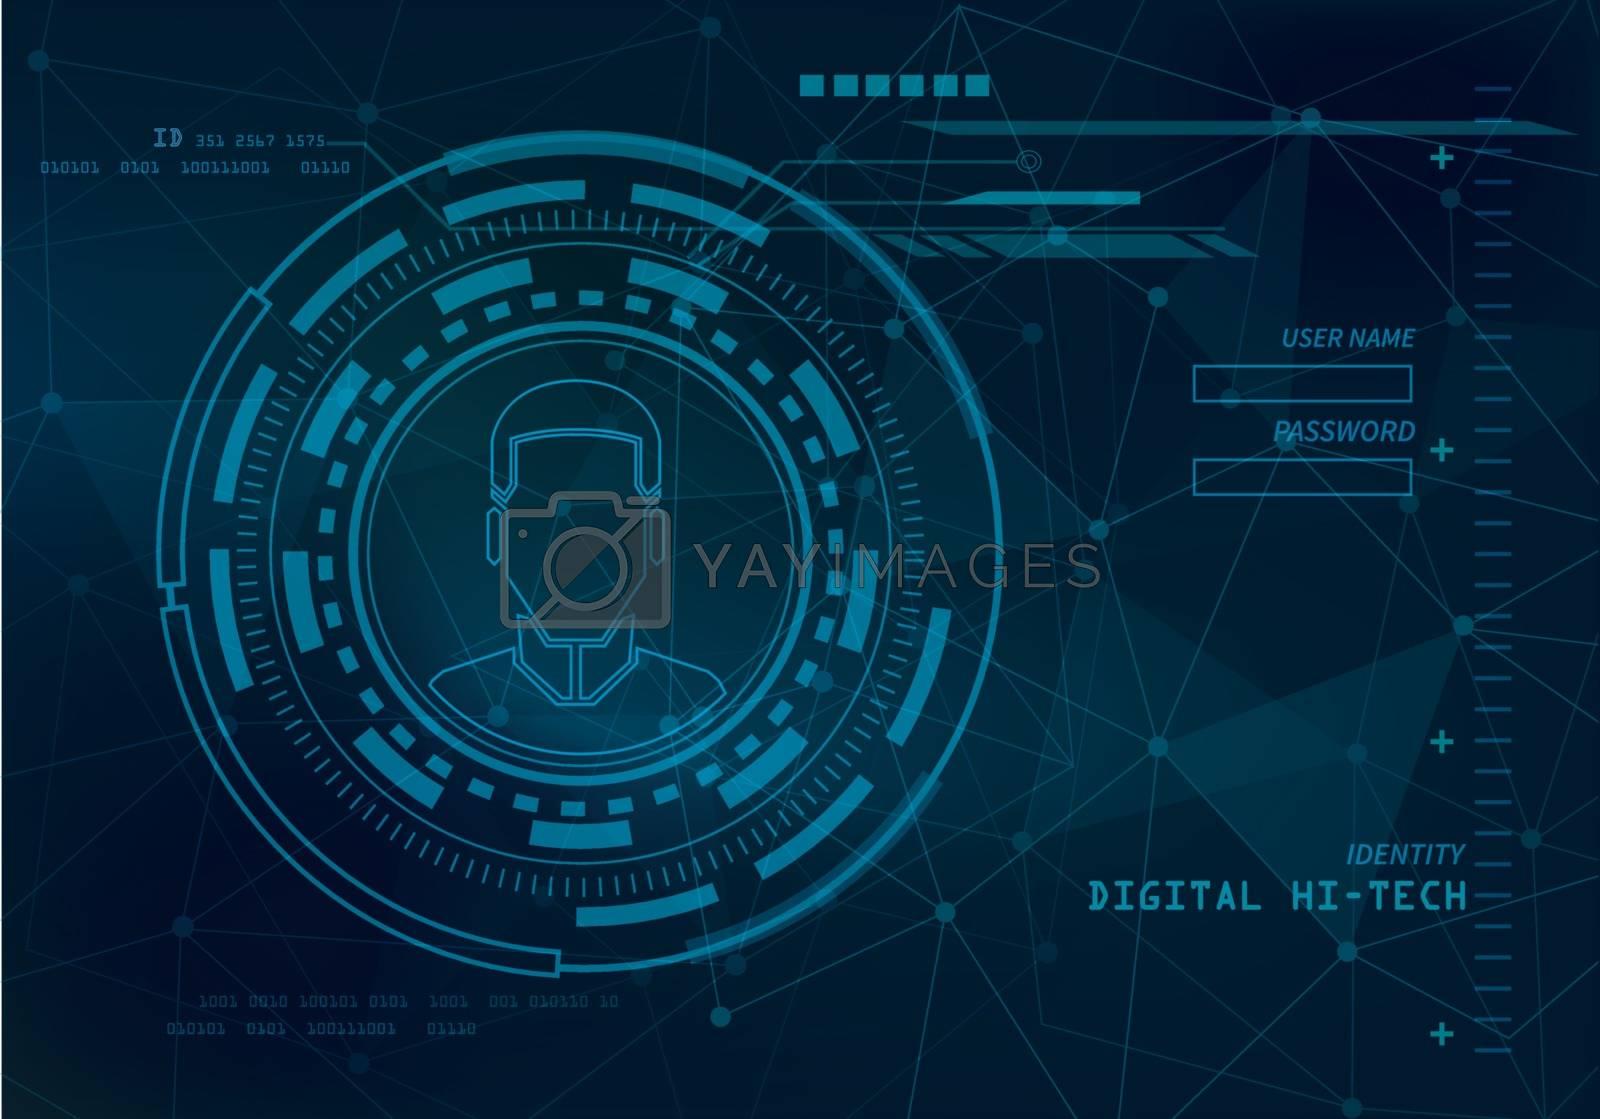 identity technology background by kaisorn